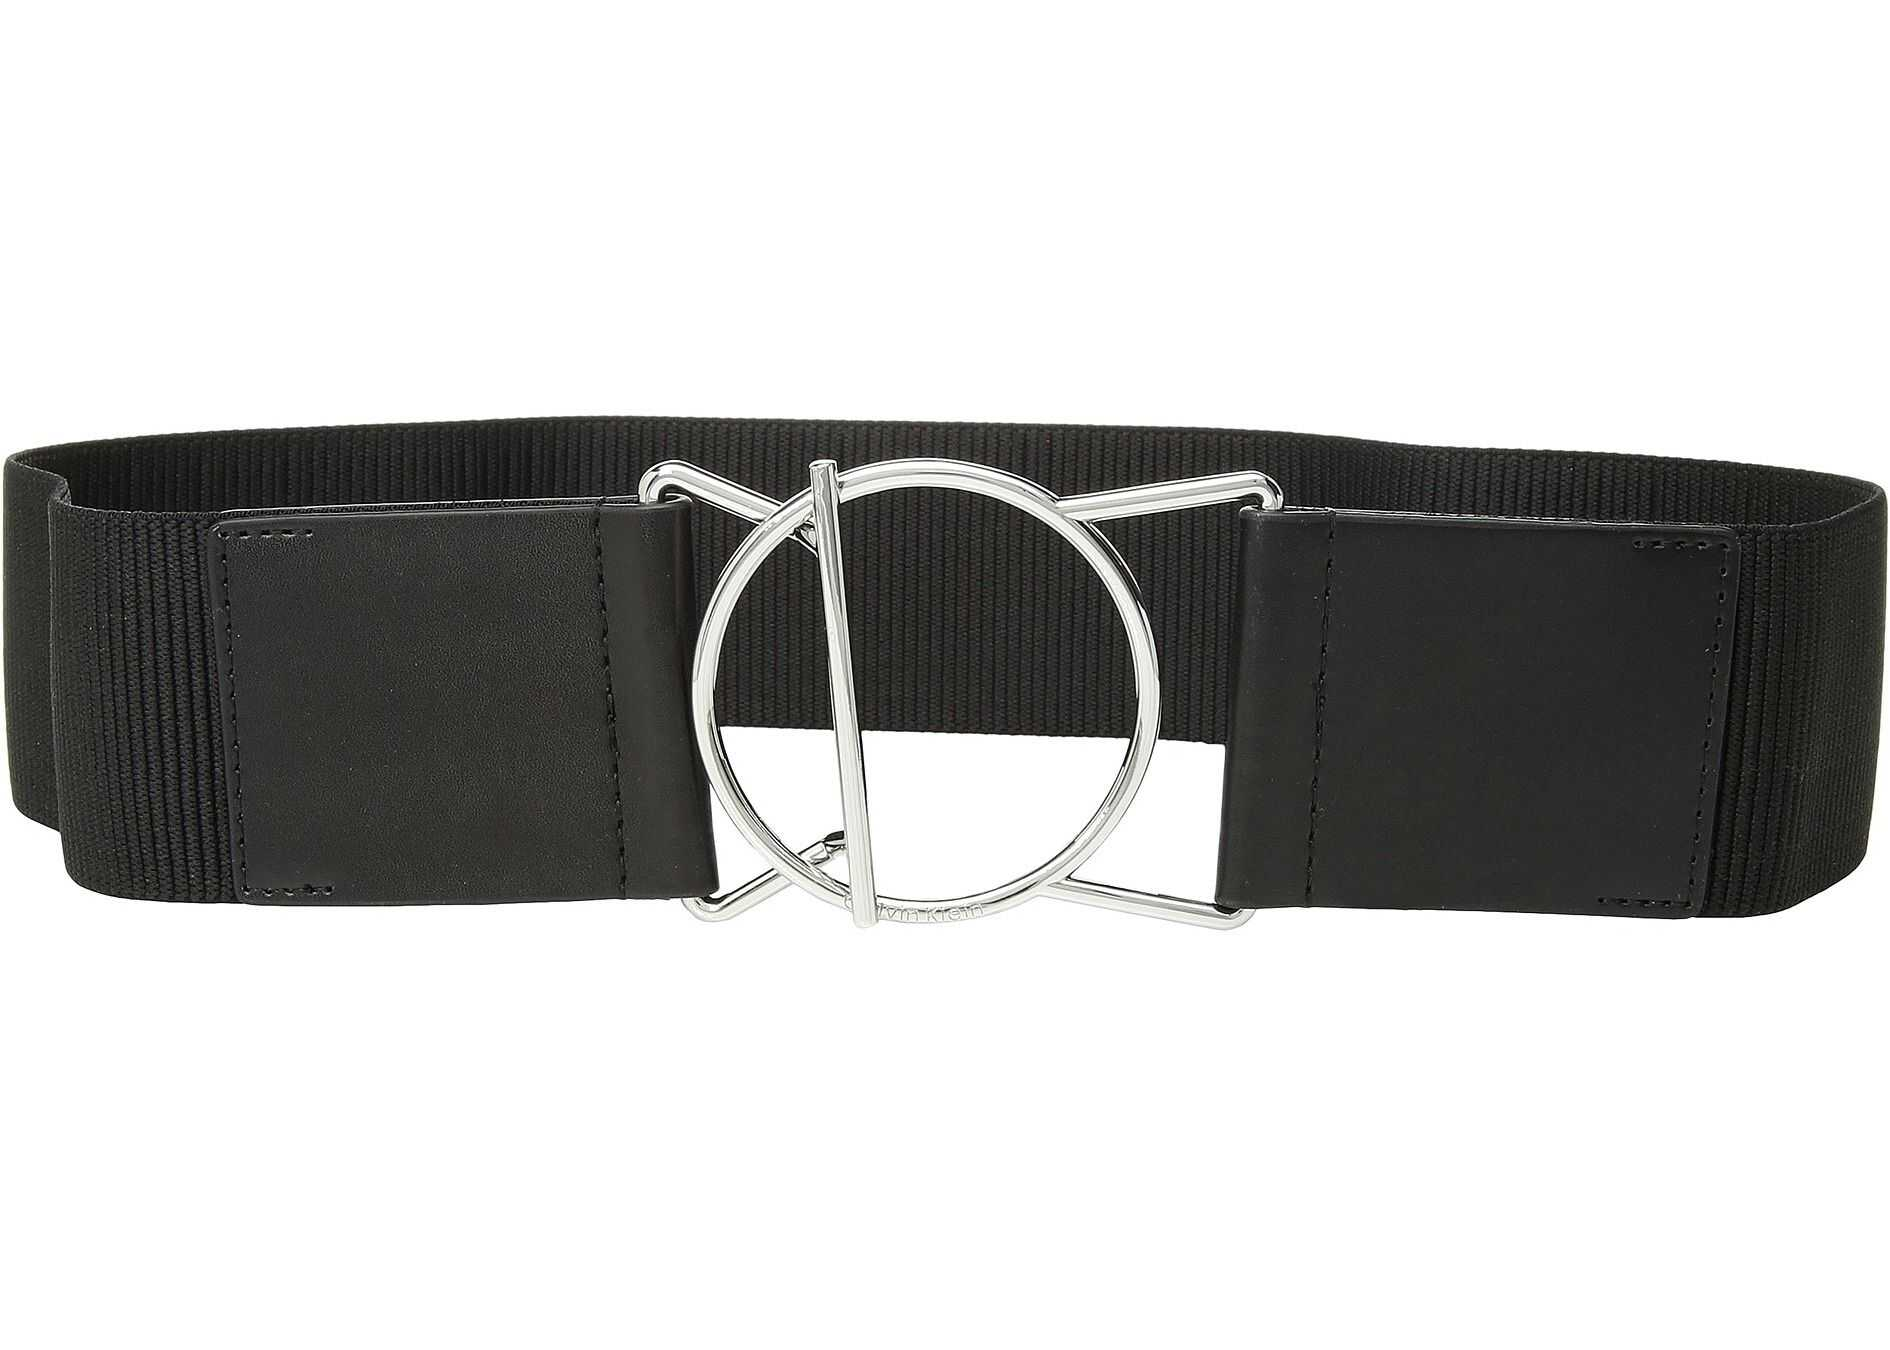 Calvin Klein 60 mm Stretch Belt Black/Brushed Nickel